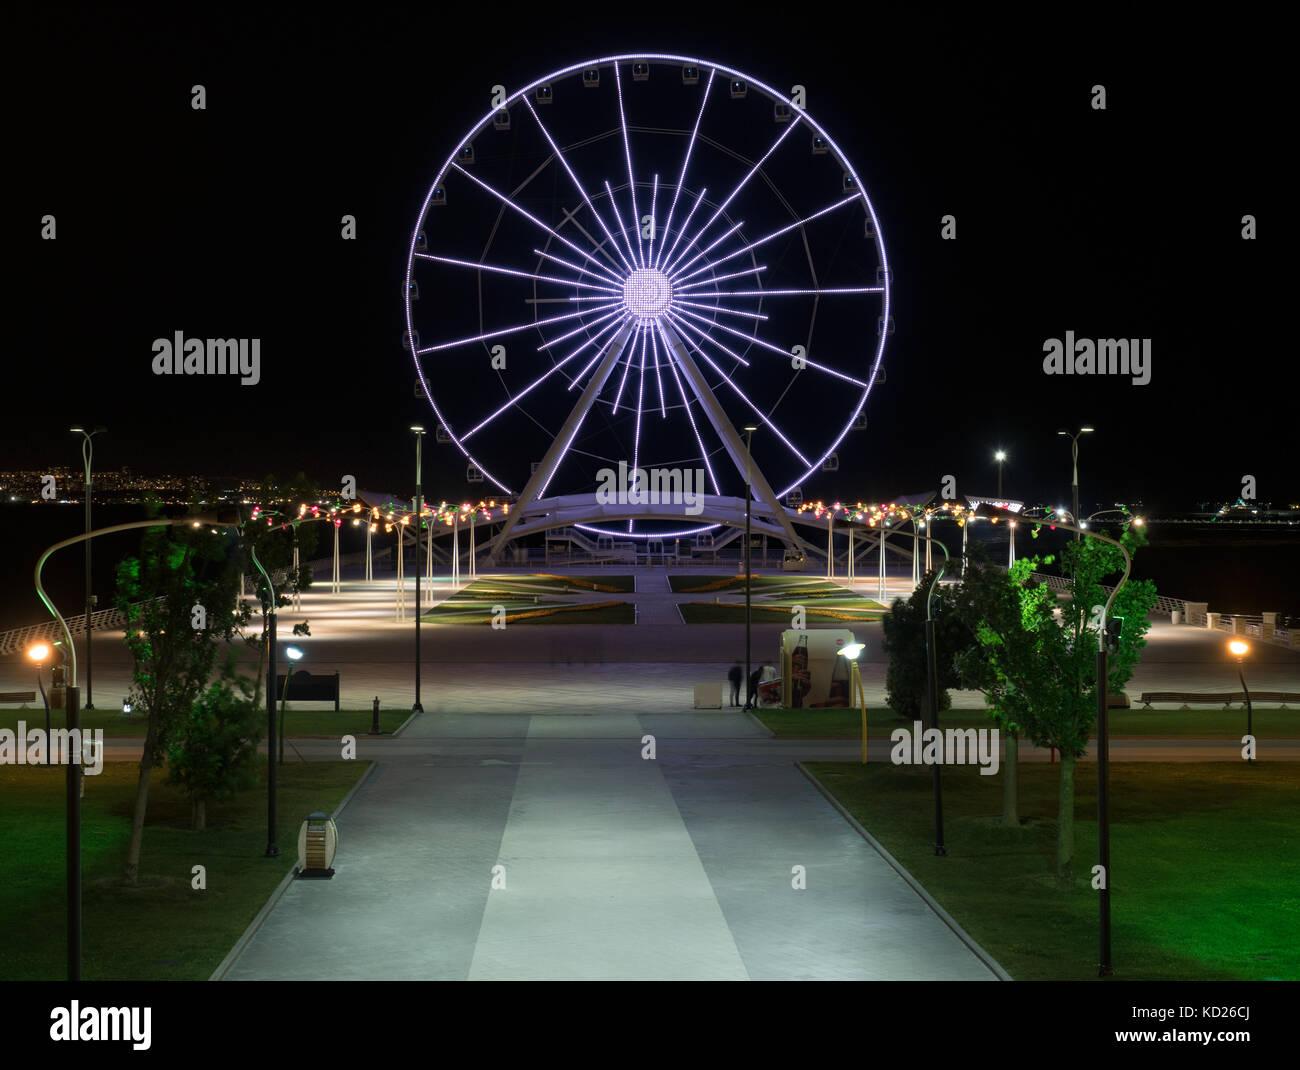 Baku Eye is a Ferris wheel on Baku Boulevard, Azerbaijan Stock Photo